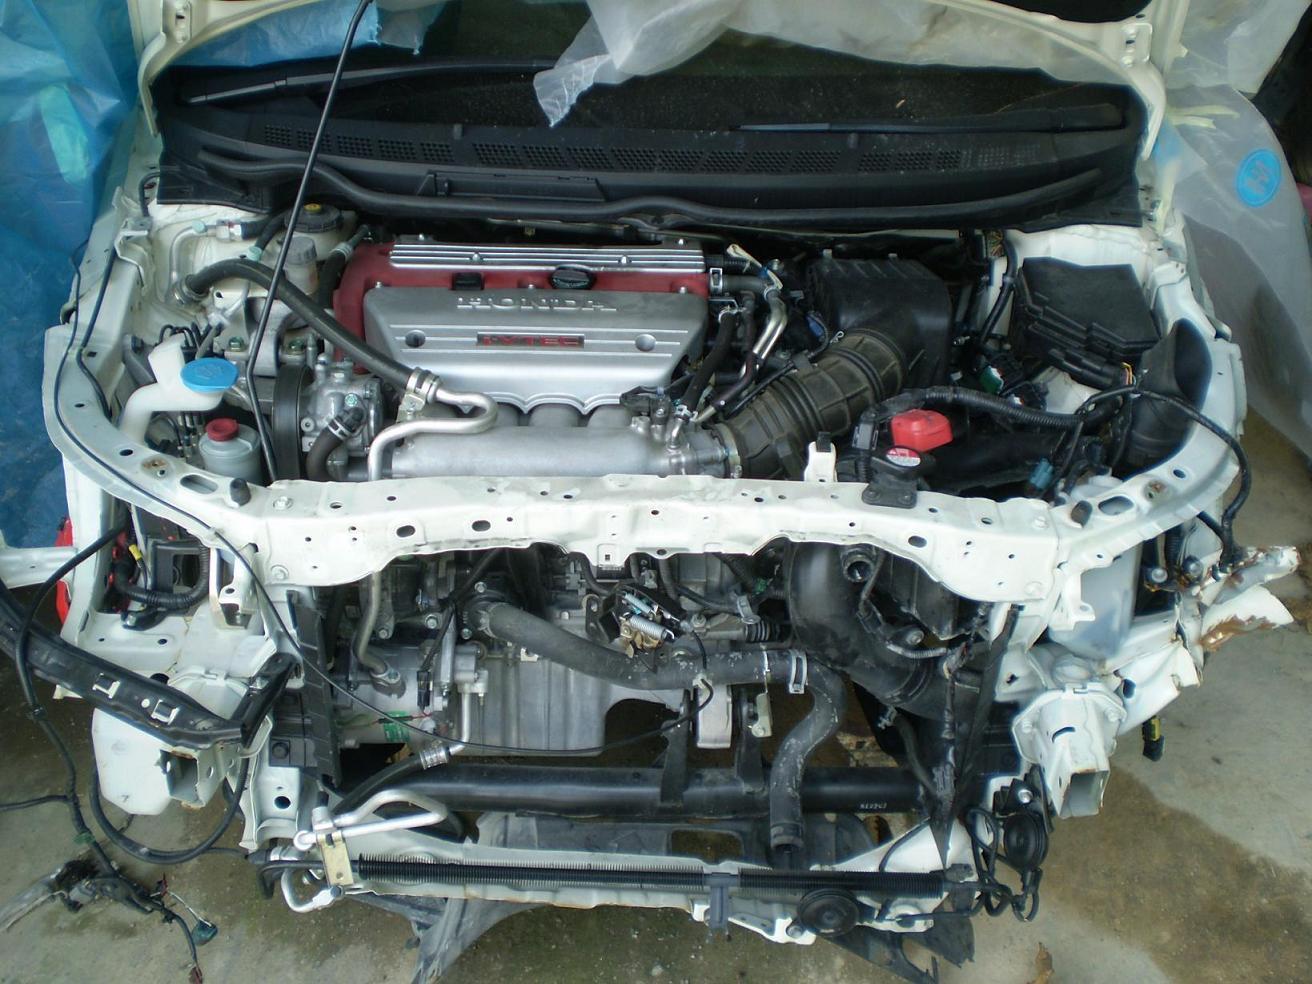 Honda Civic Engines For Sale >> Used Engine Honda Civic Fd2 Buy Engine Product On Alibaba Com